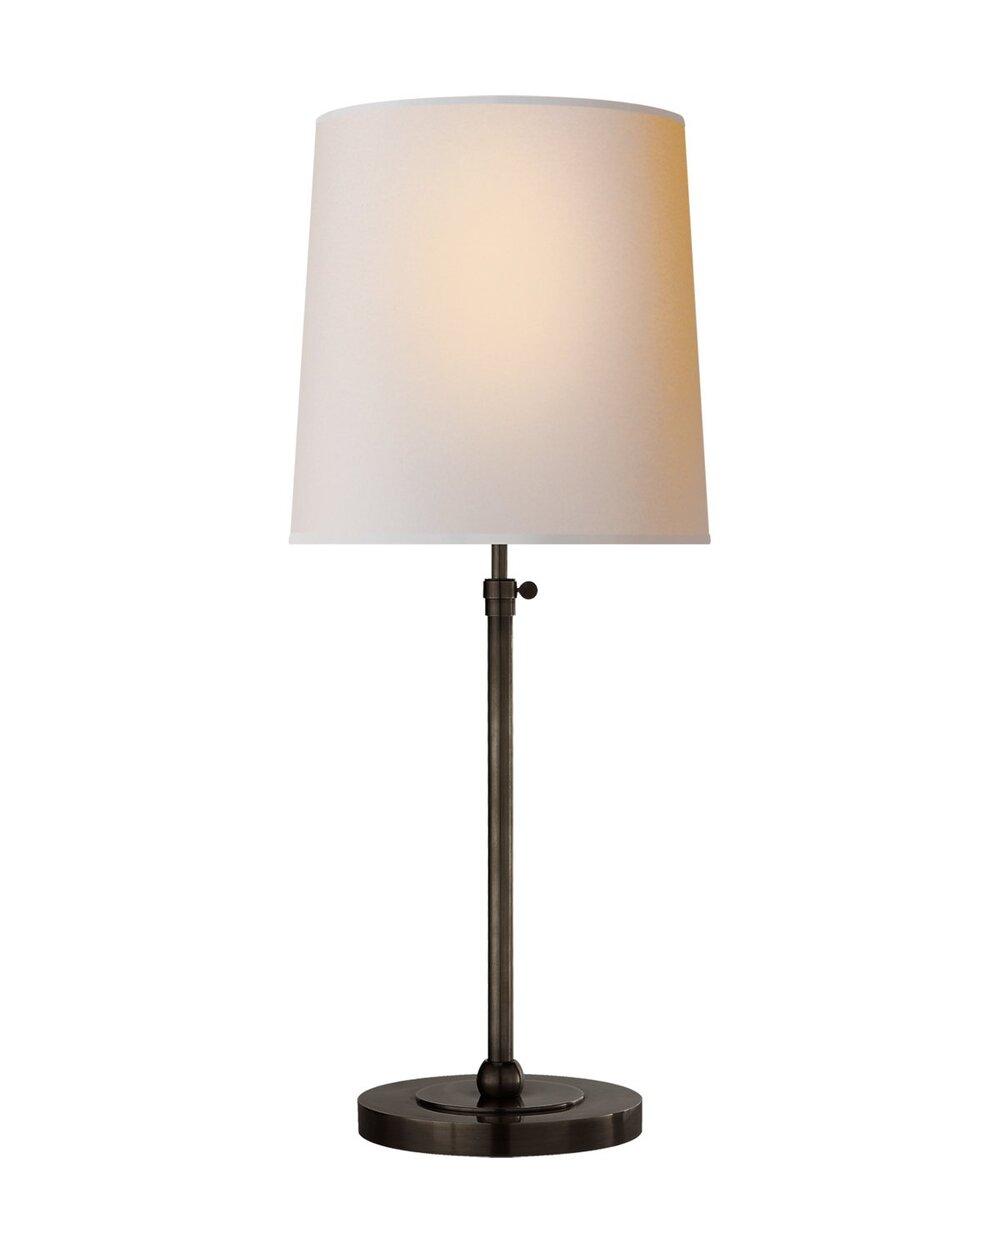 Bryant_Table_Lamp_4.jpg